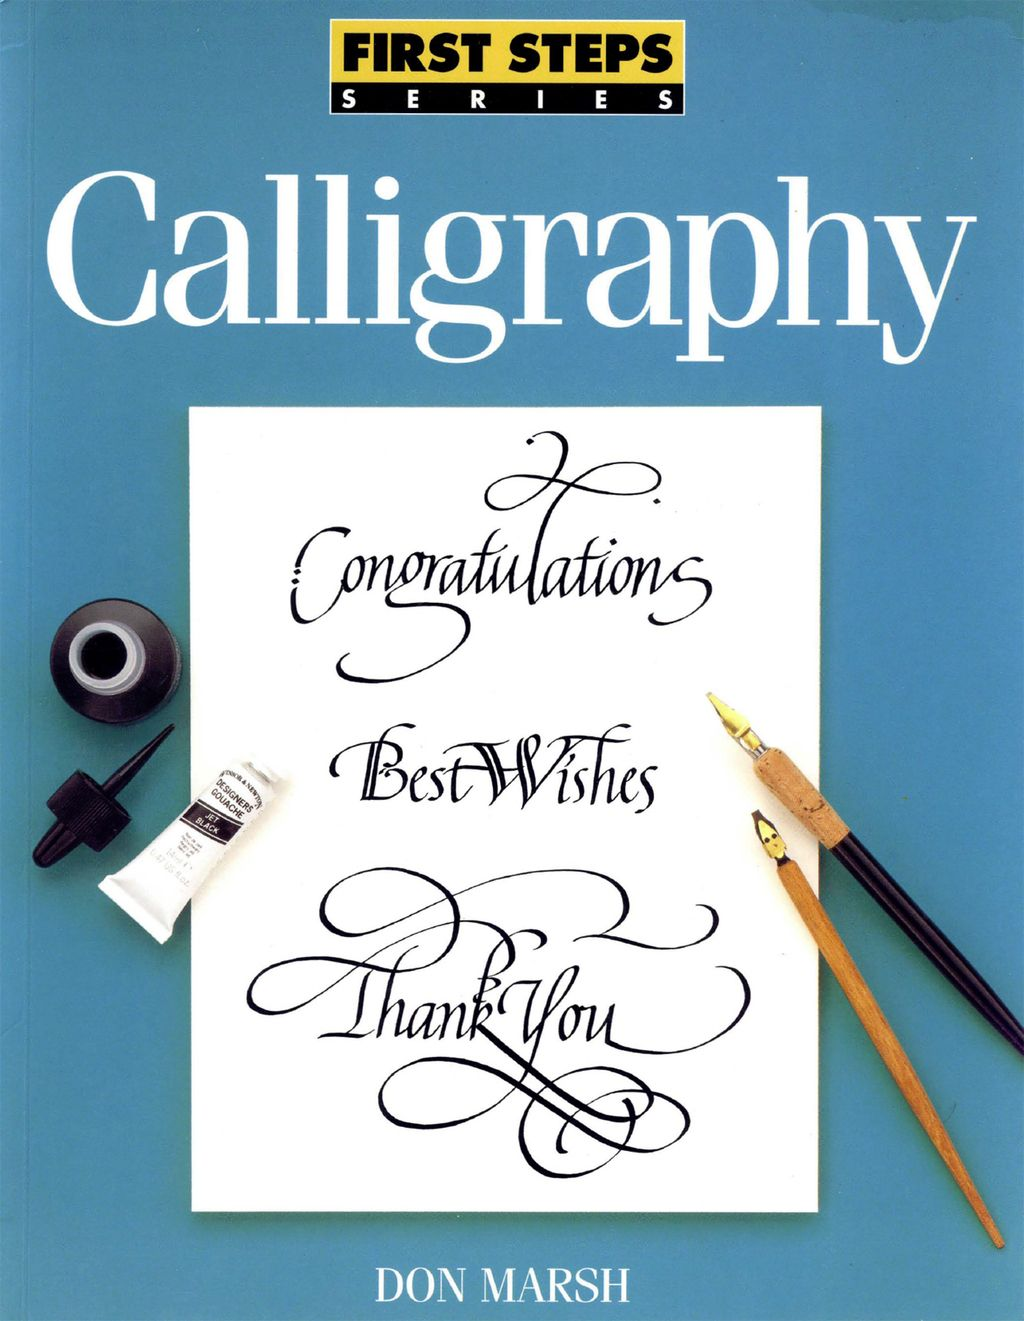 Calligraphy Ebook